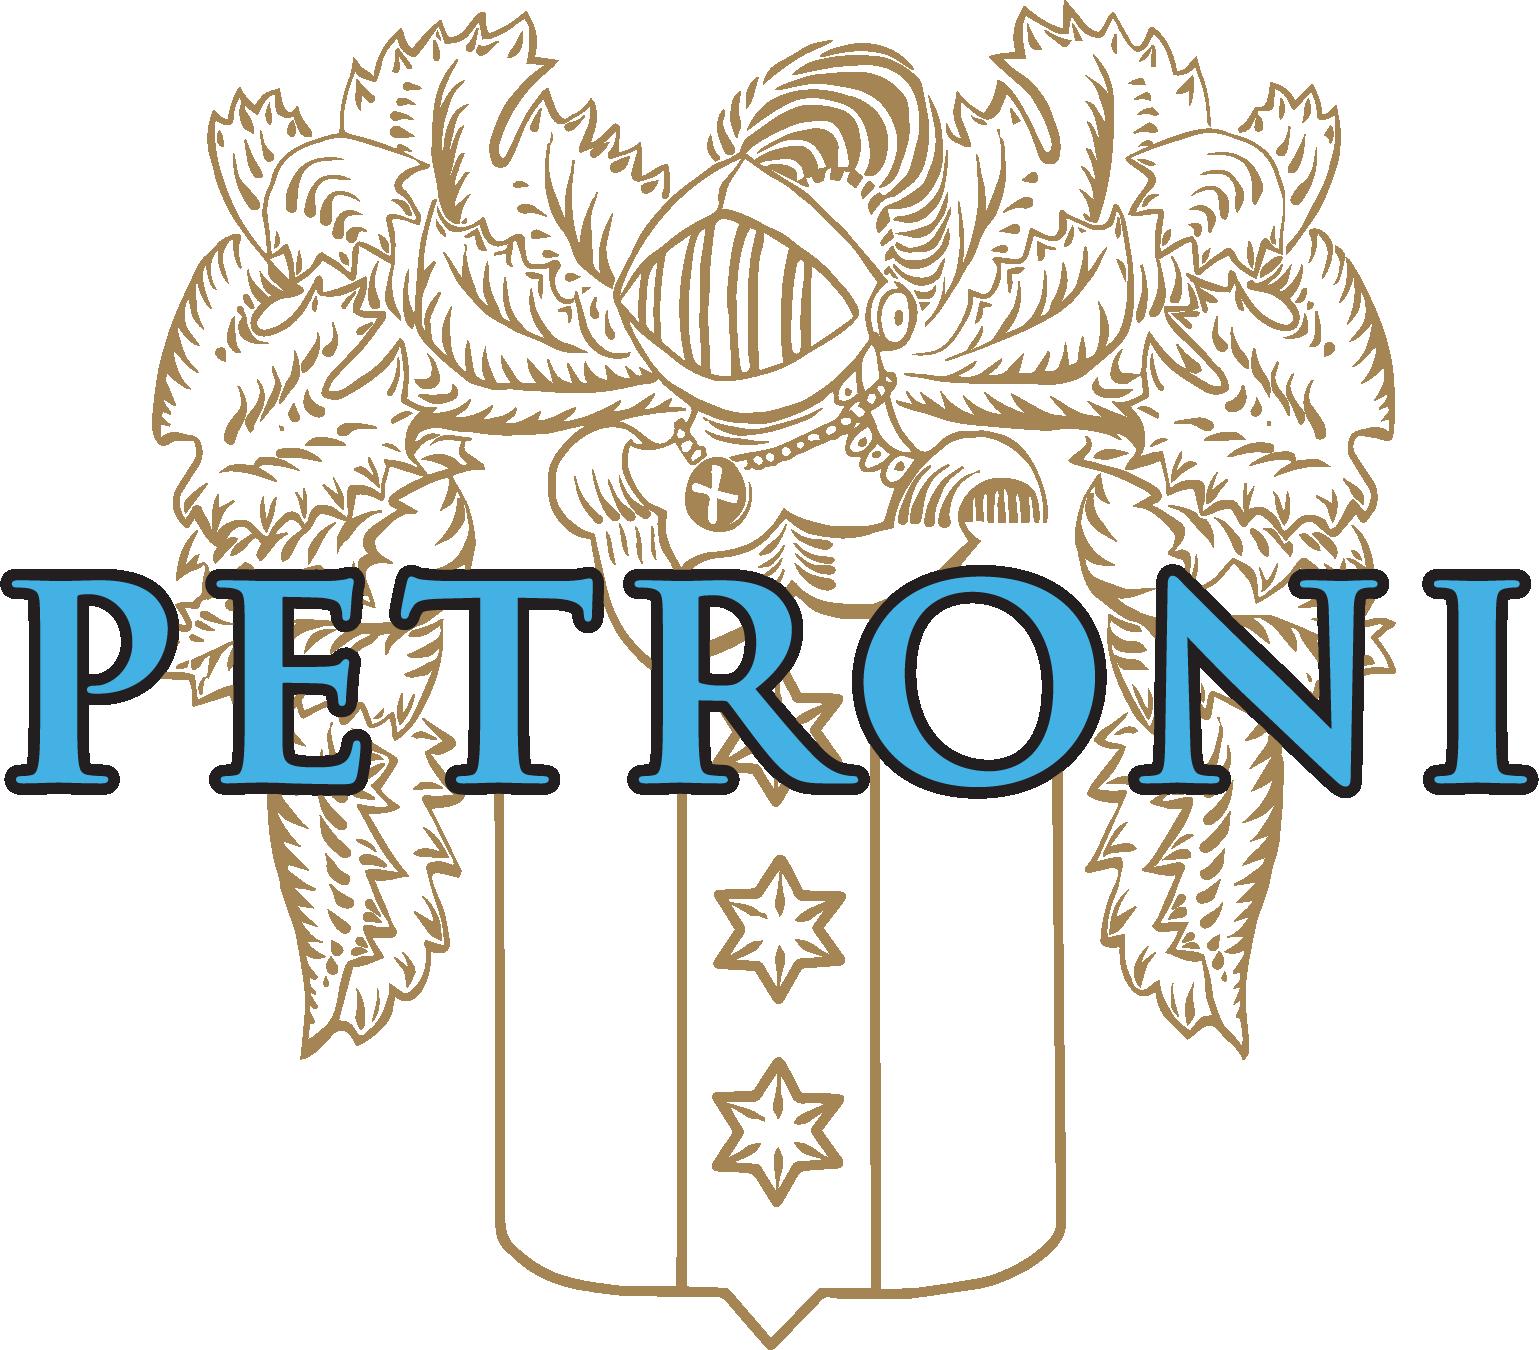 Petroni Logo